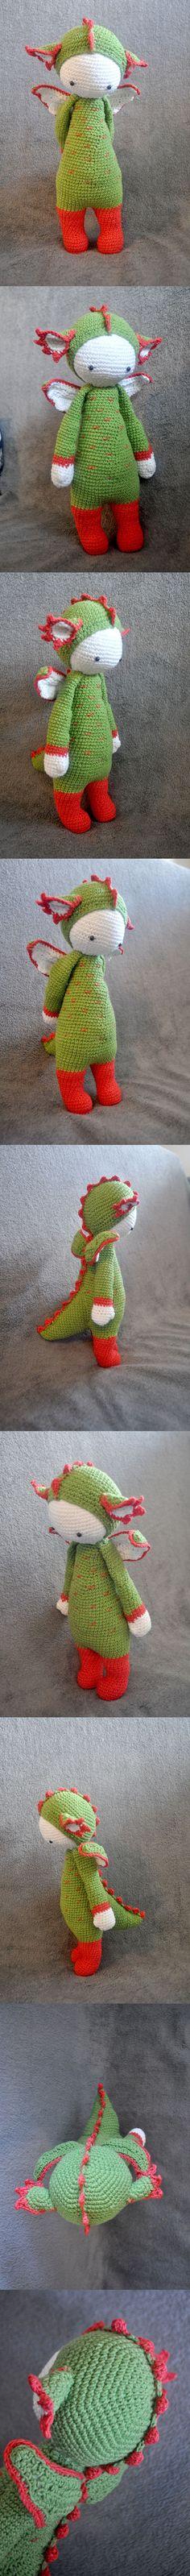 Lalylala dragon Dirk